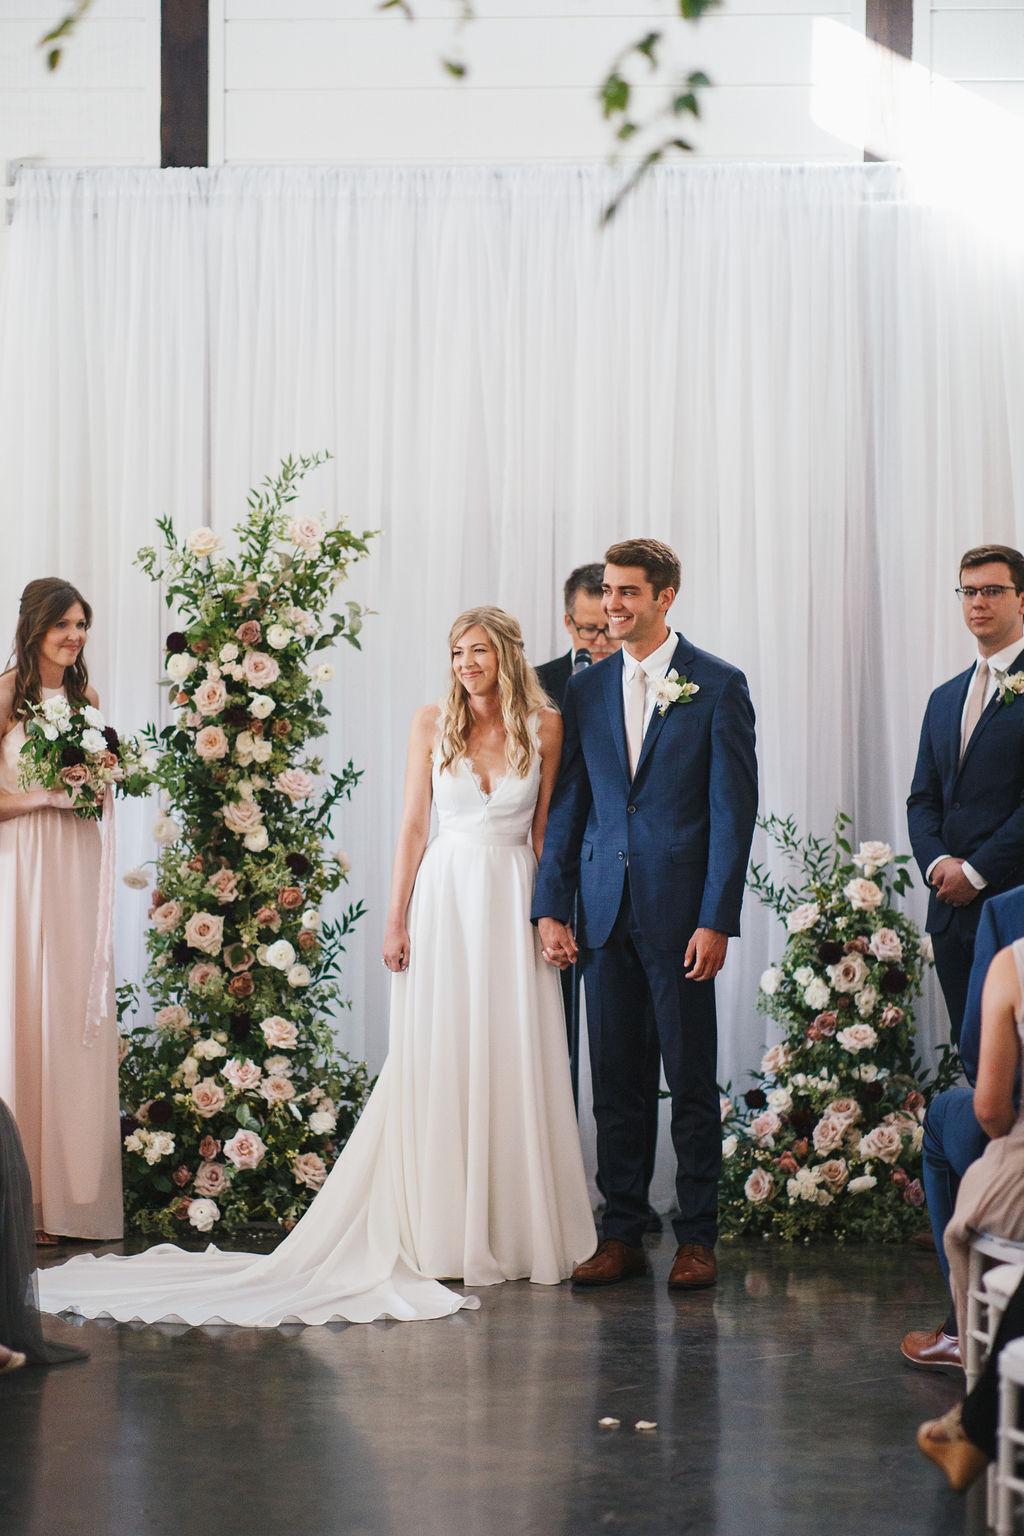 Bixby White Barn Tulsa Wedding 71.jpg